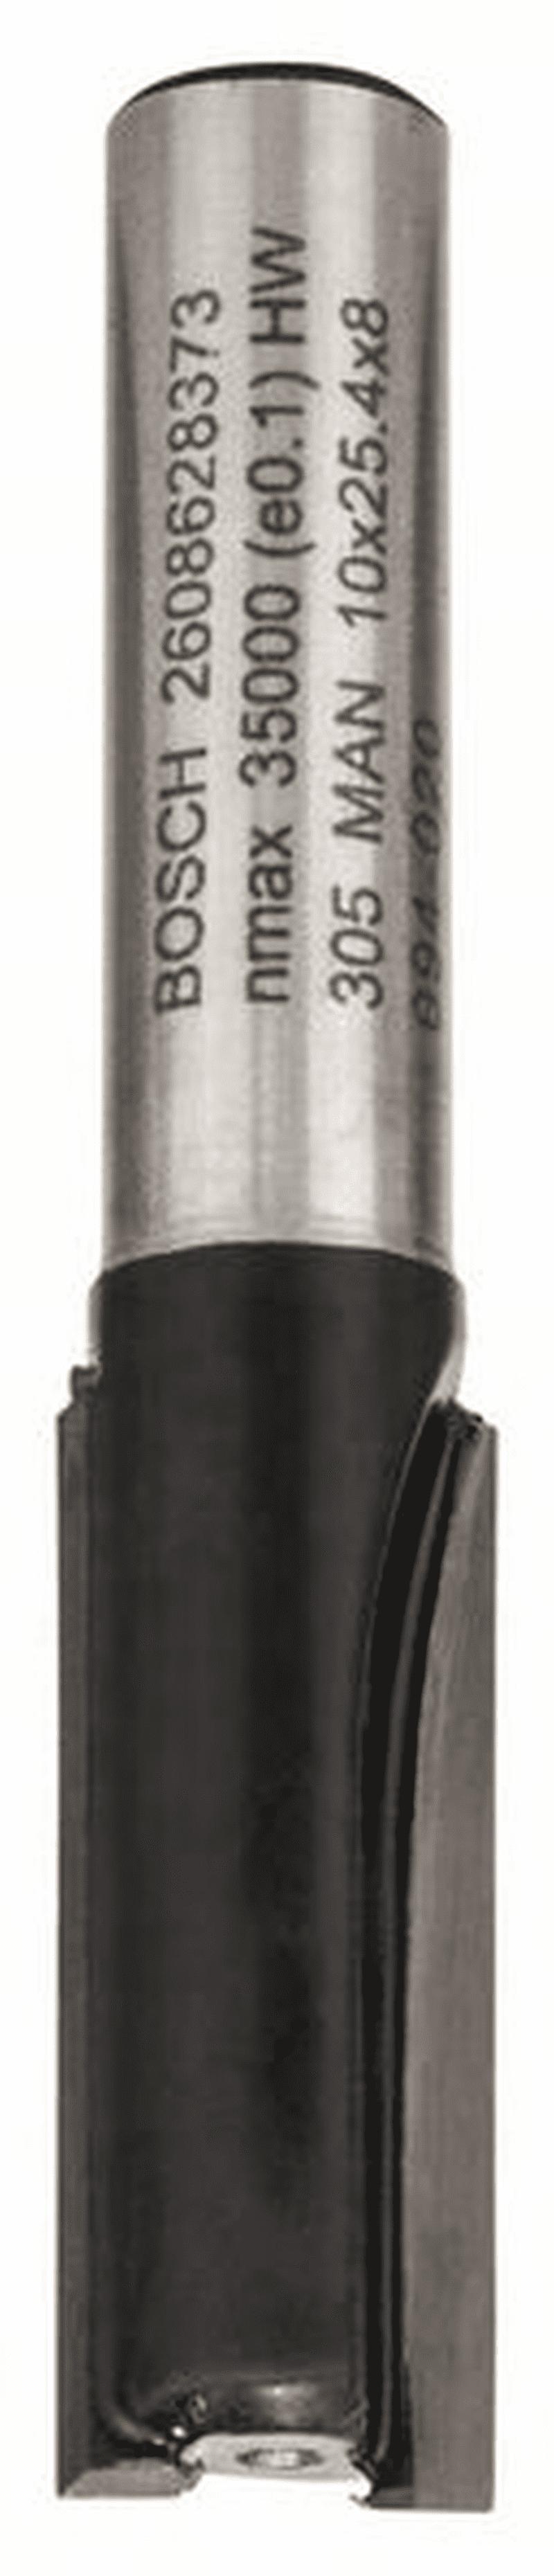 G 56 mm Bosch Nutfräser D1 8 mm 8 mm L 25,4 mm